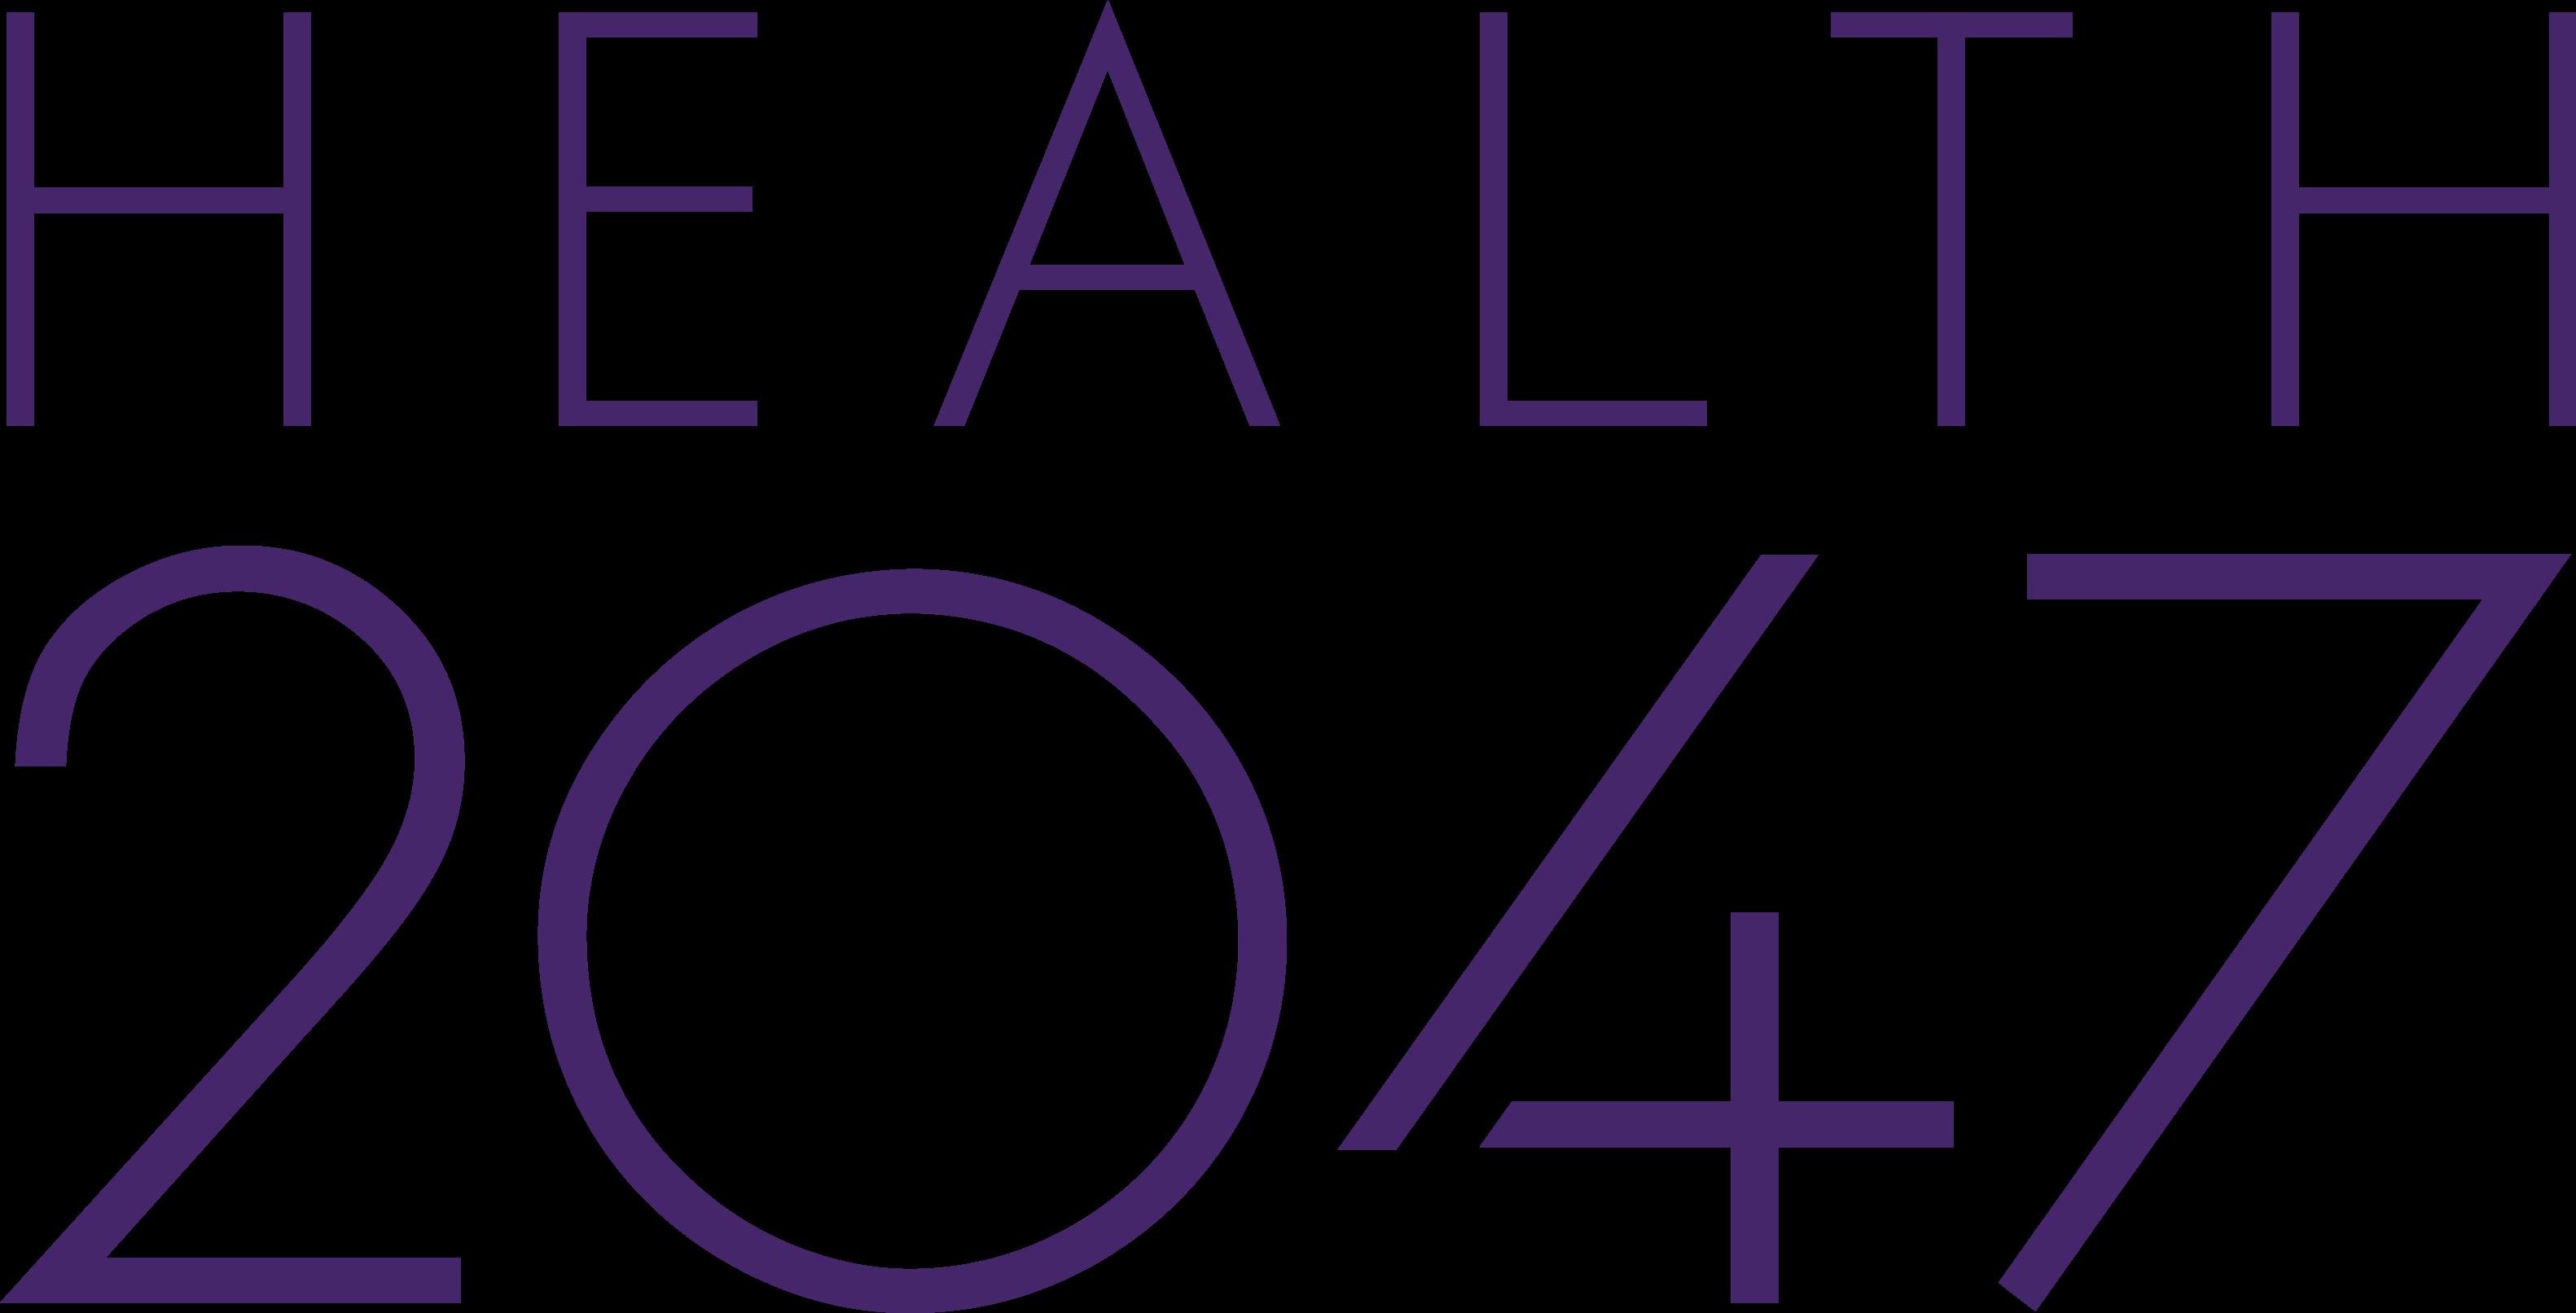 Health2047 logo